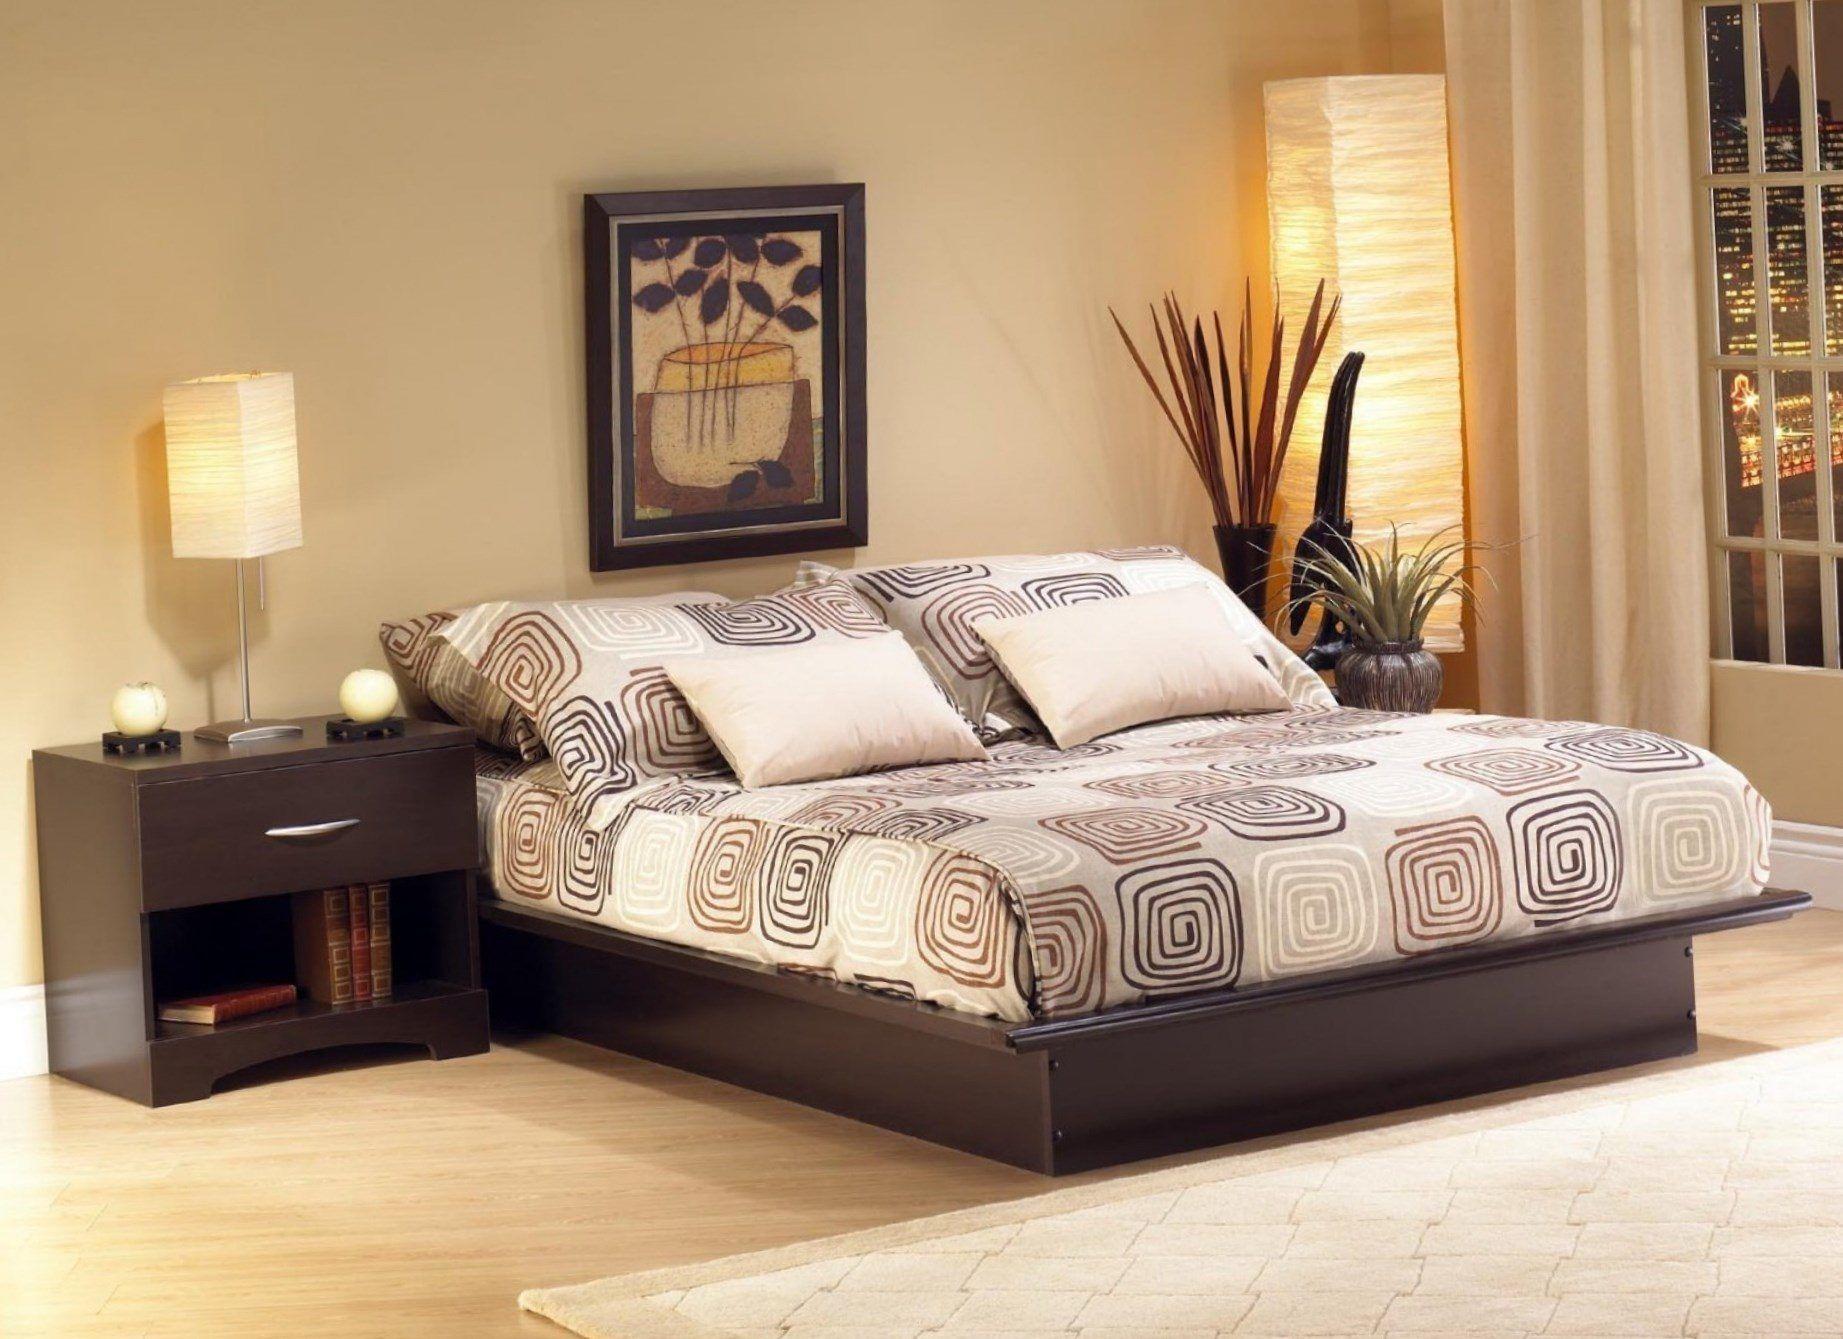 Real Simple Bedroom Ideas Https Bedroom Design 2017 Info Small Real Simple Bedroom Ideas Htm Nabory Mebeli Dlya Spalni Krovati Na Omoste Spalnye Garnitury